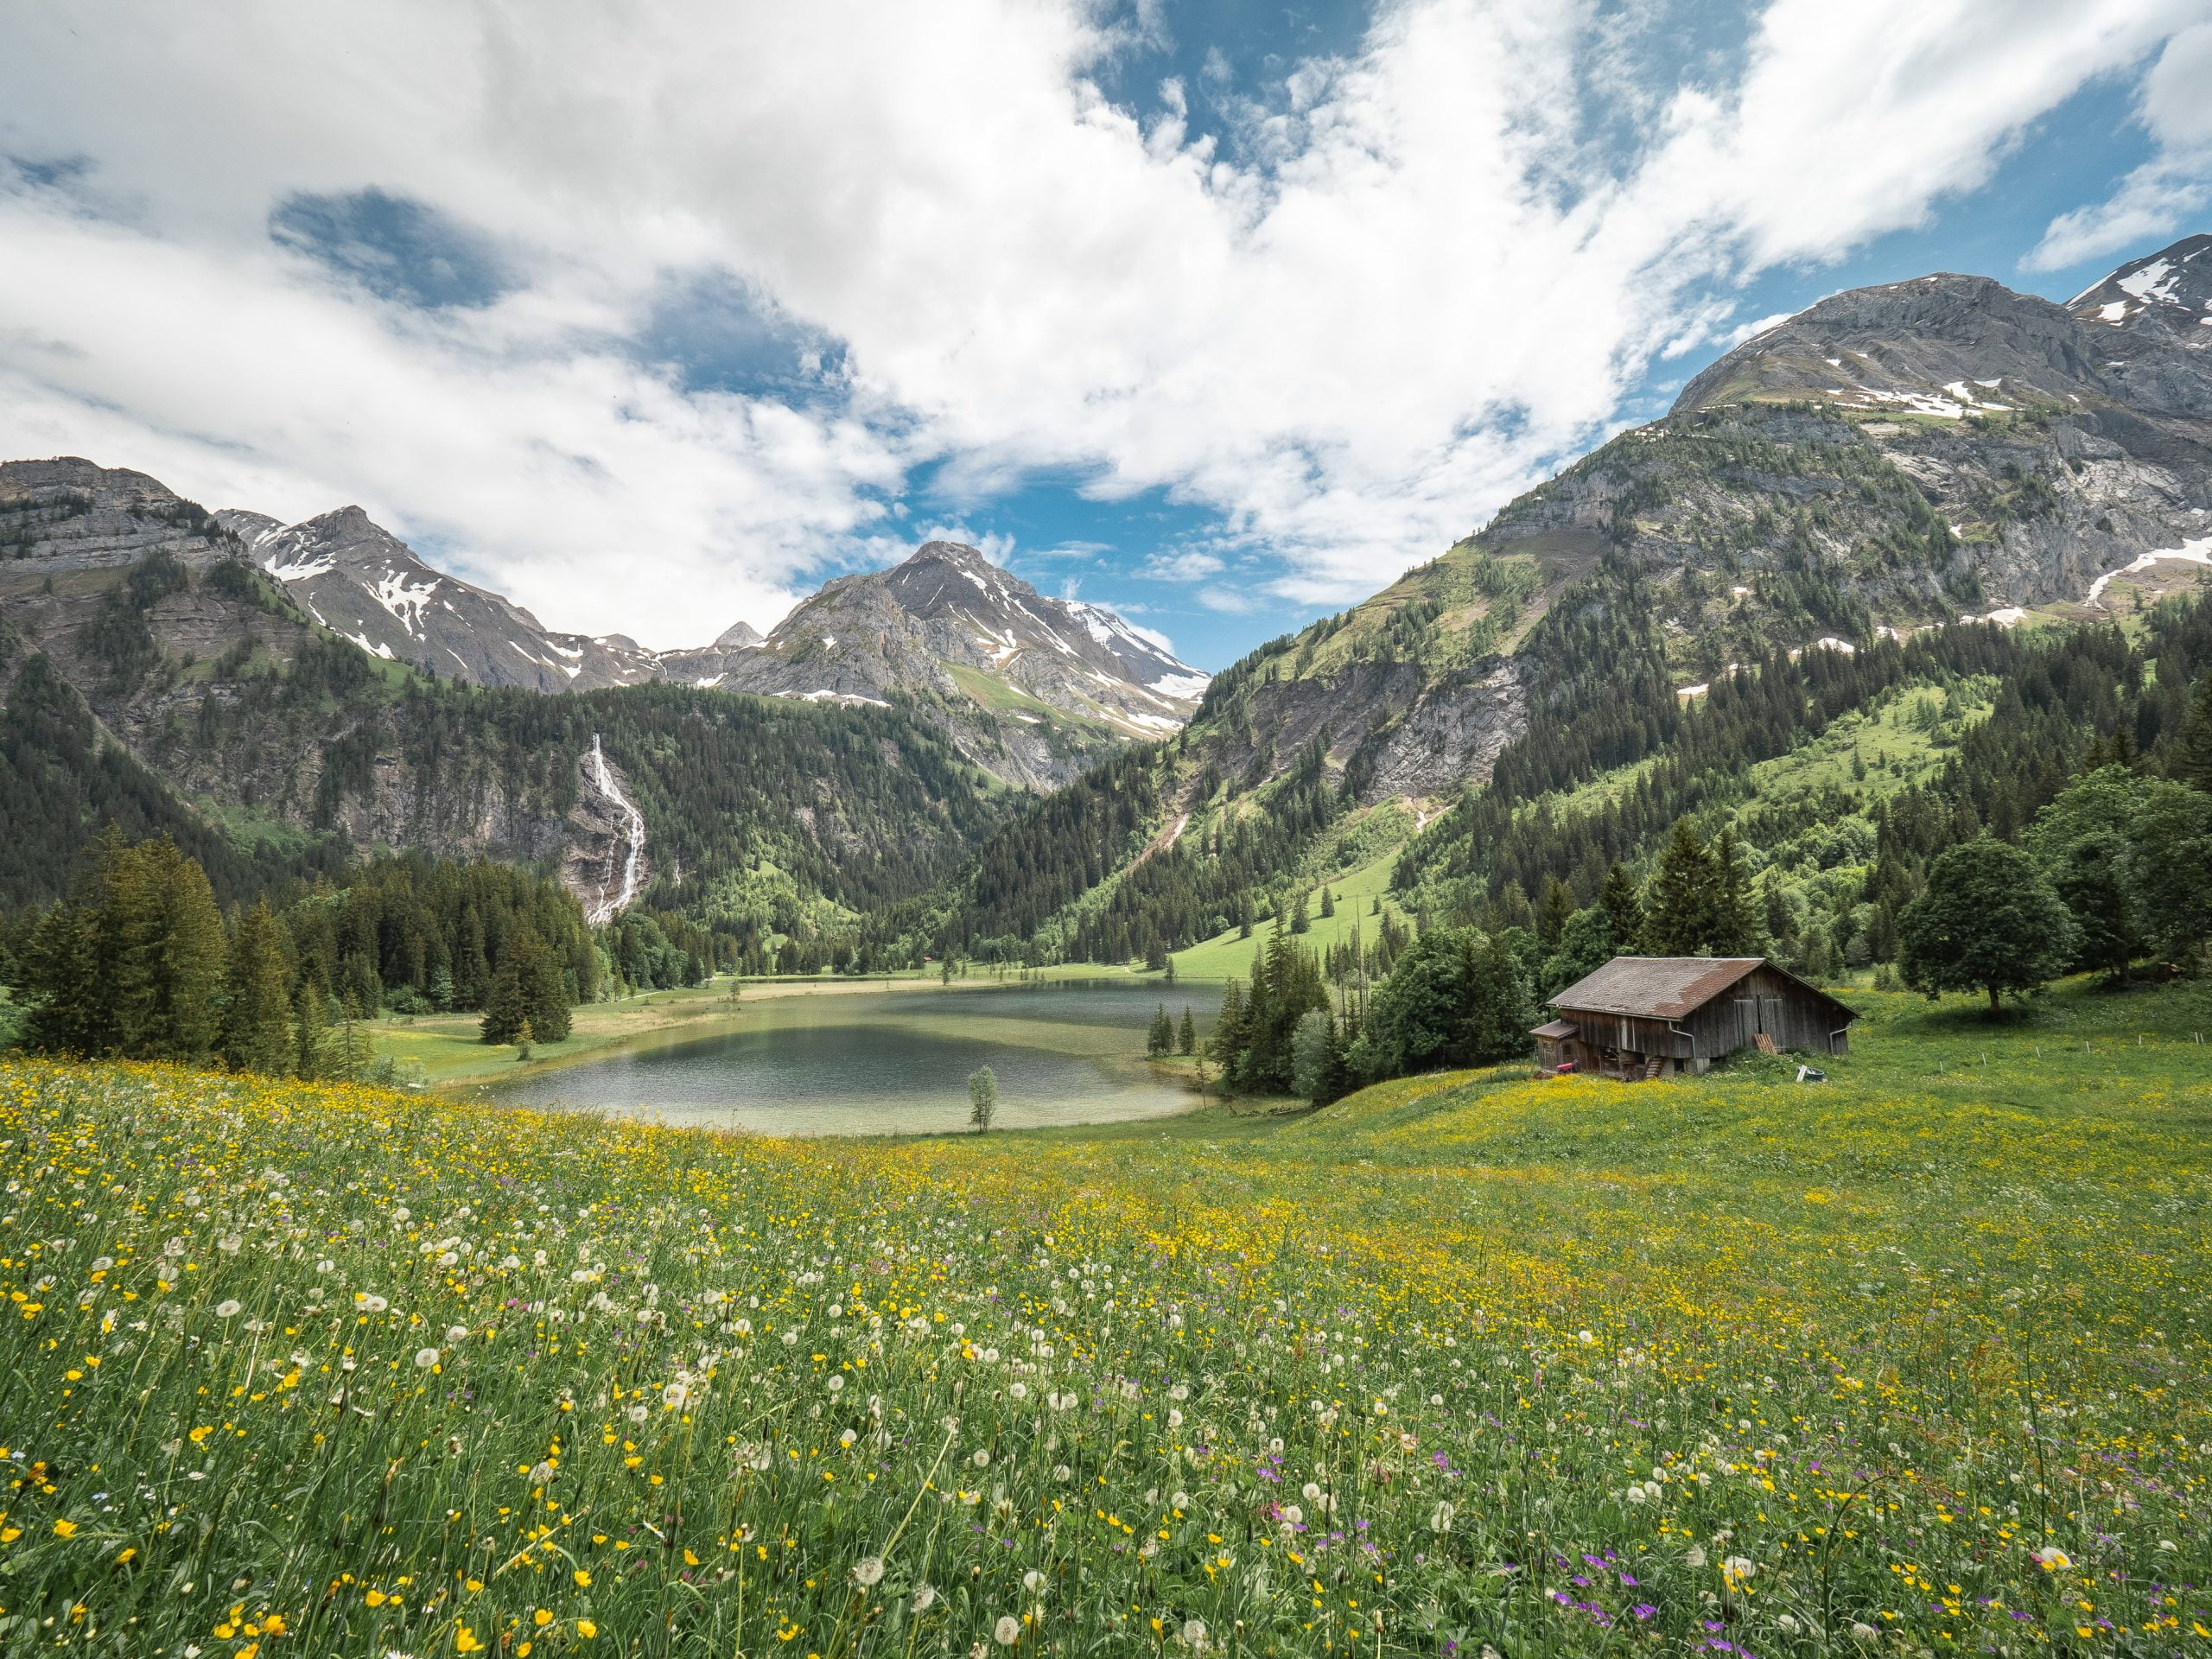 lac de lauenen - canton de berne Gstaad